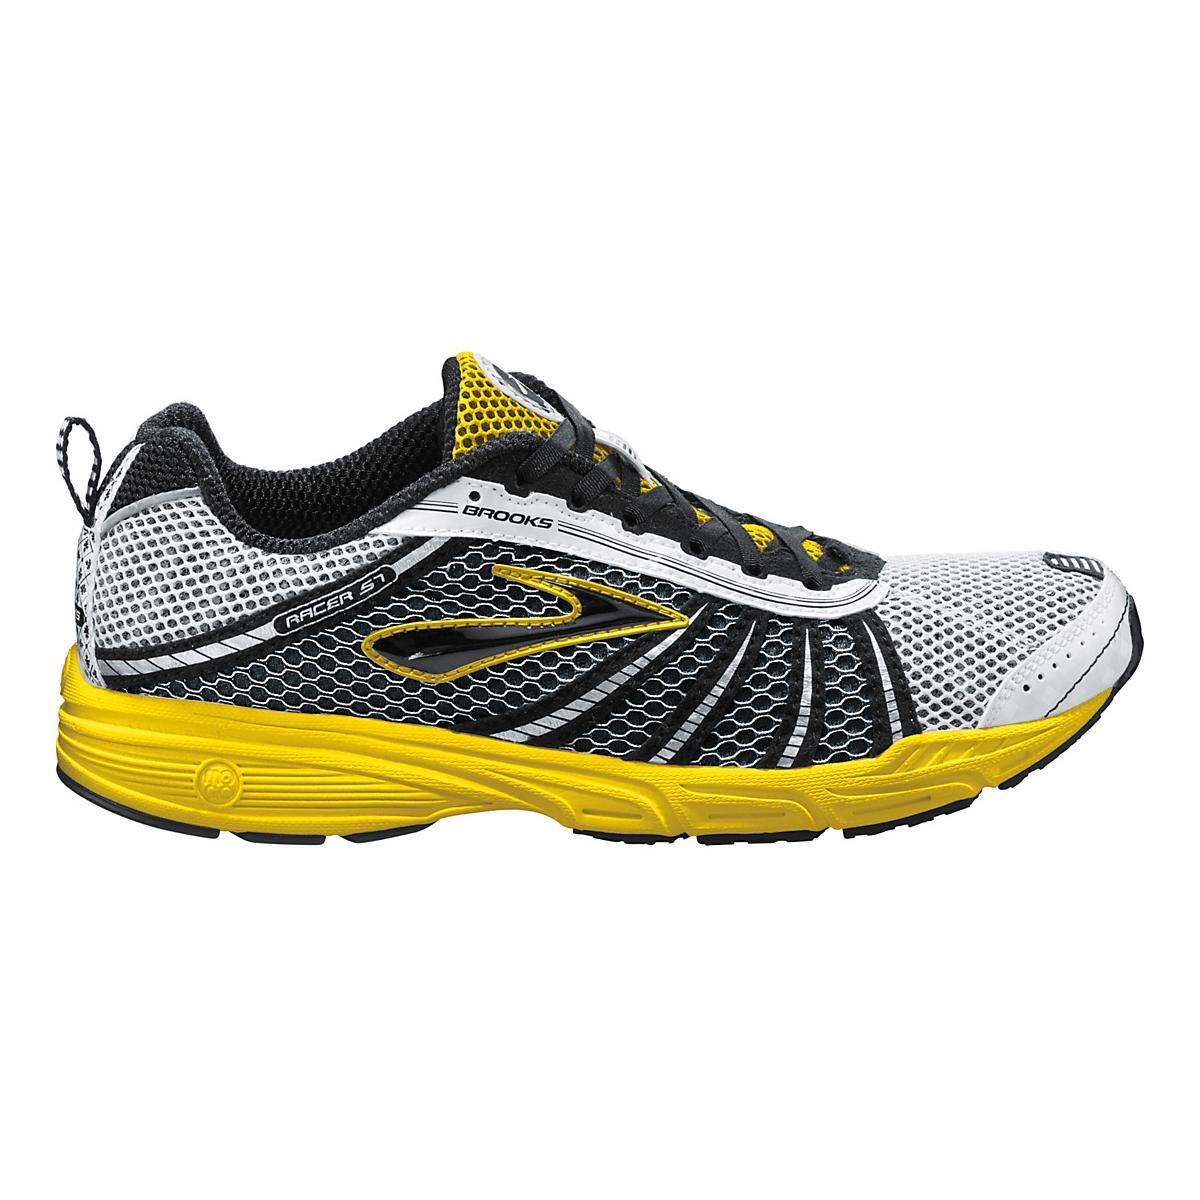 0959901e740aa Brooks Racer ST 5 Running Shoe at Road Runner Sports